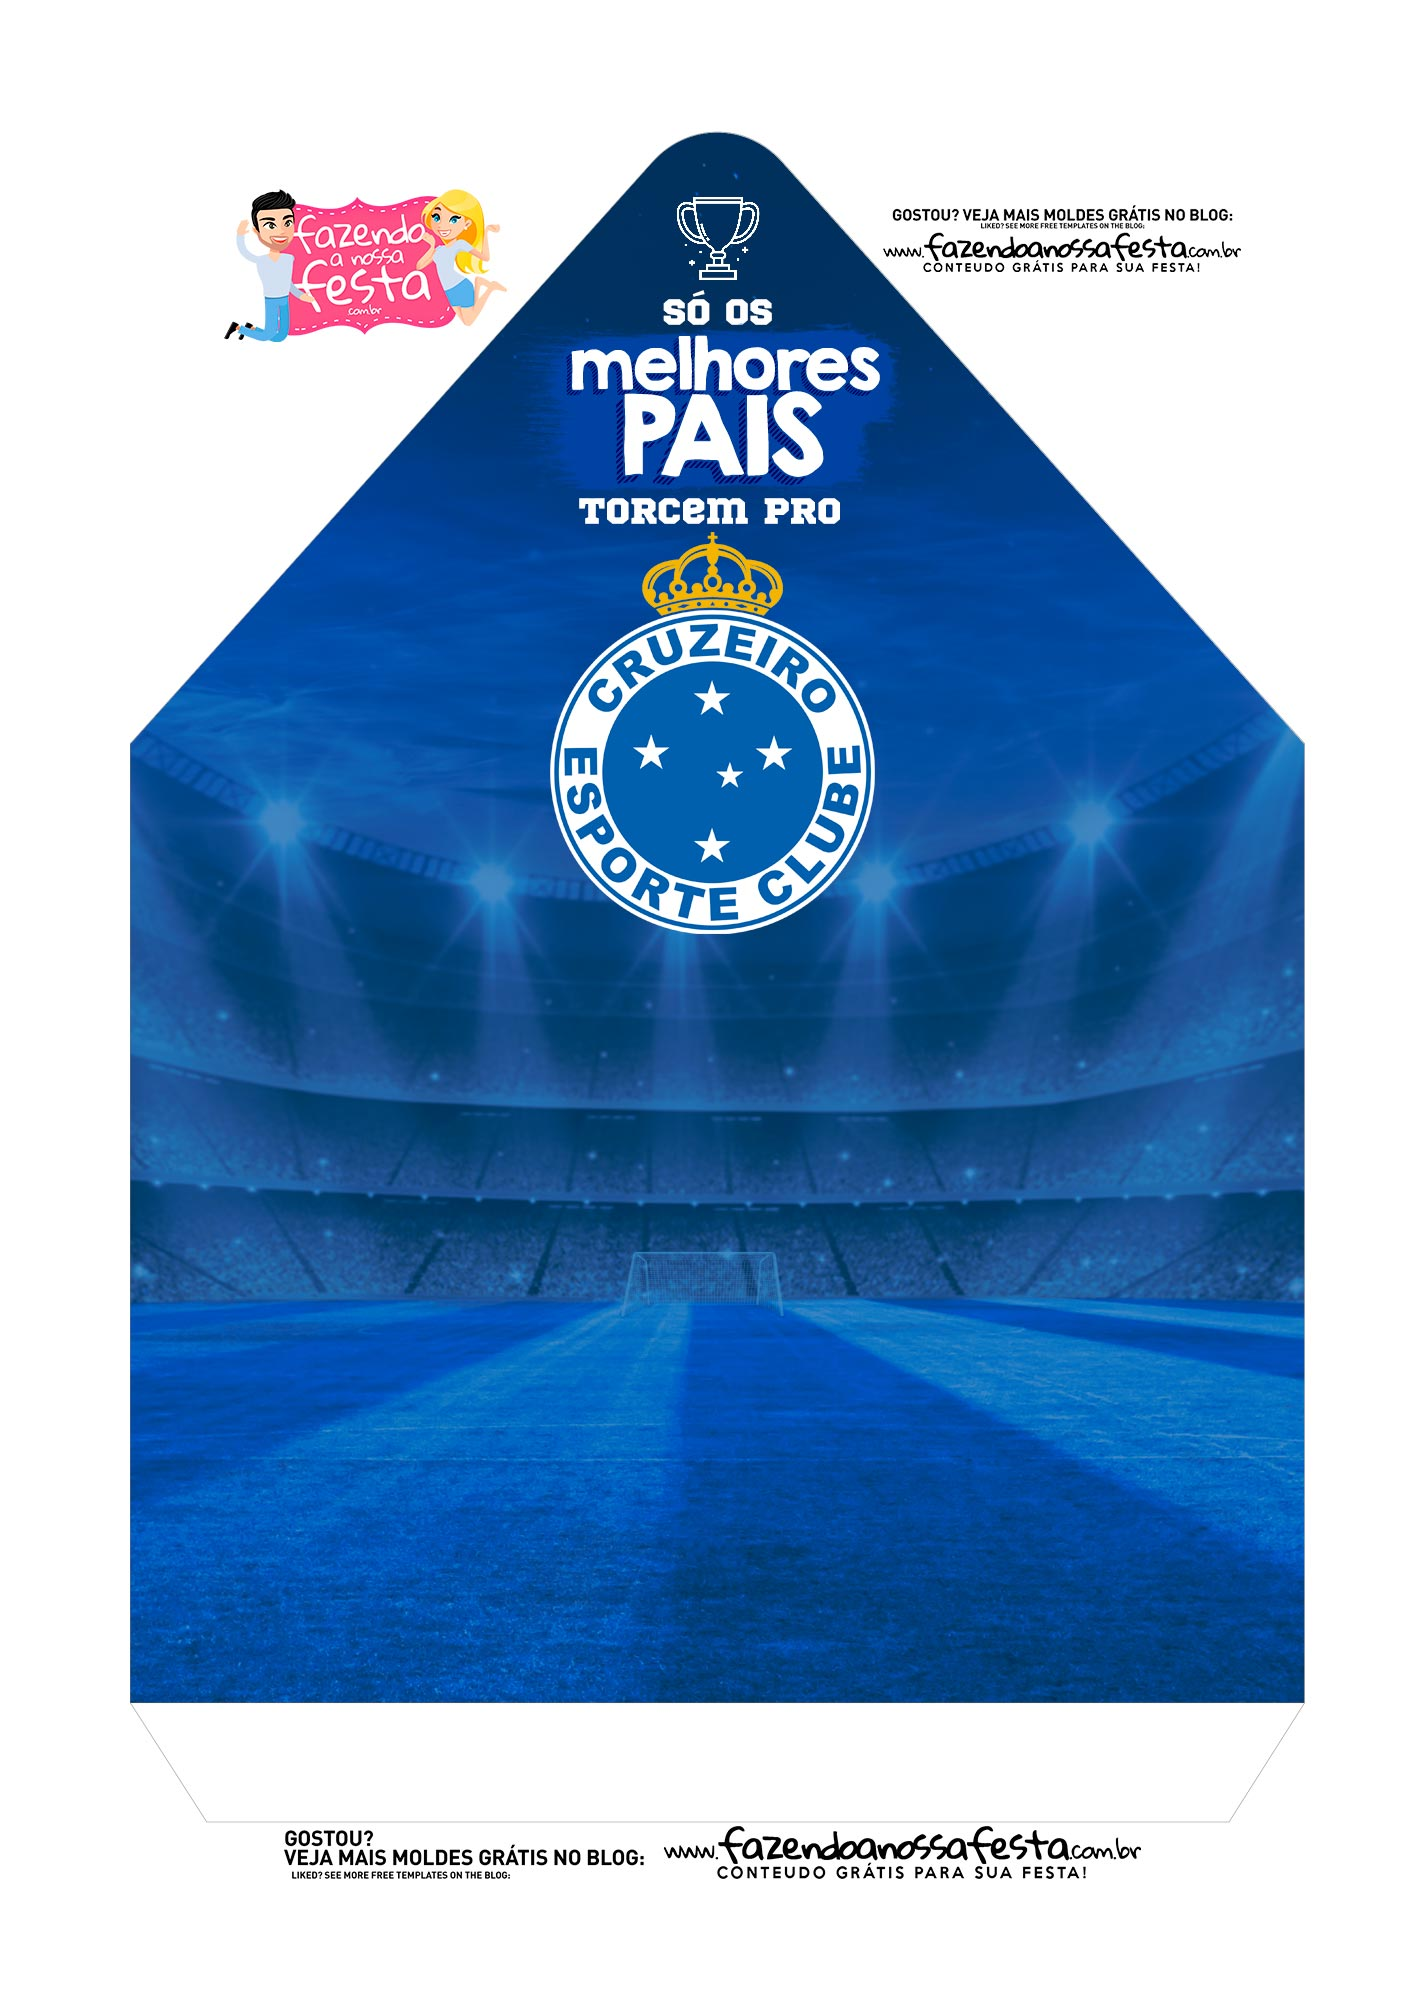 Caixa Envelope Cruzeiro 2